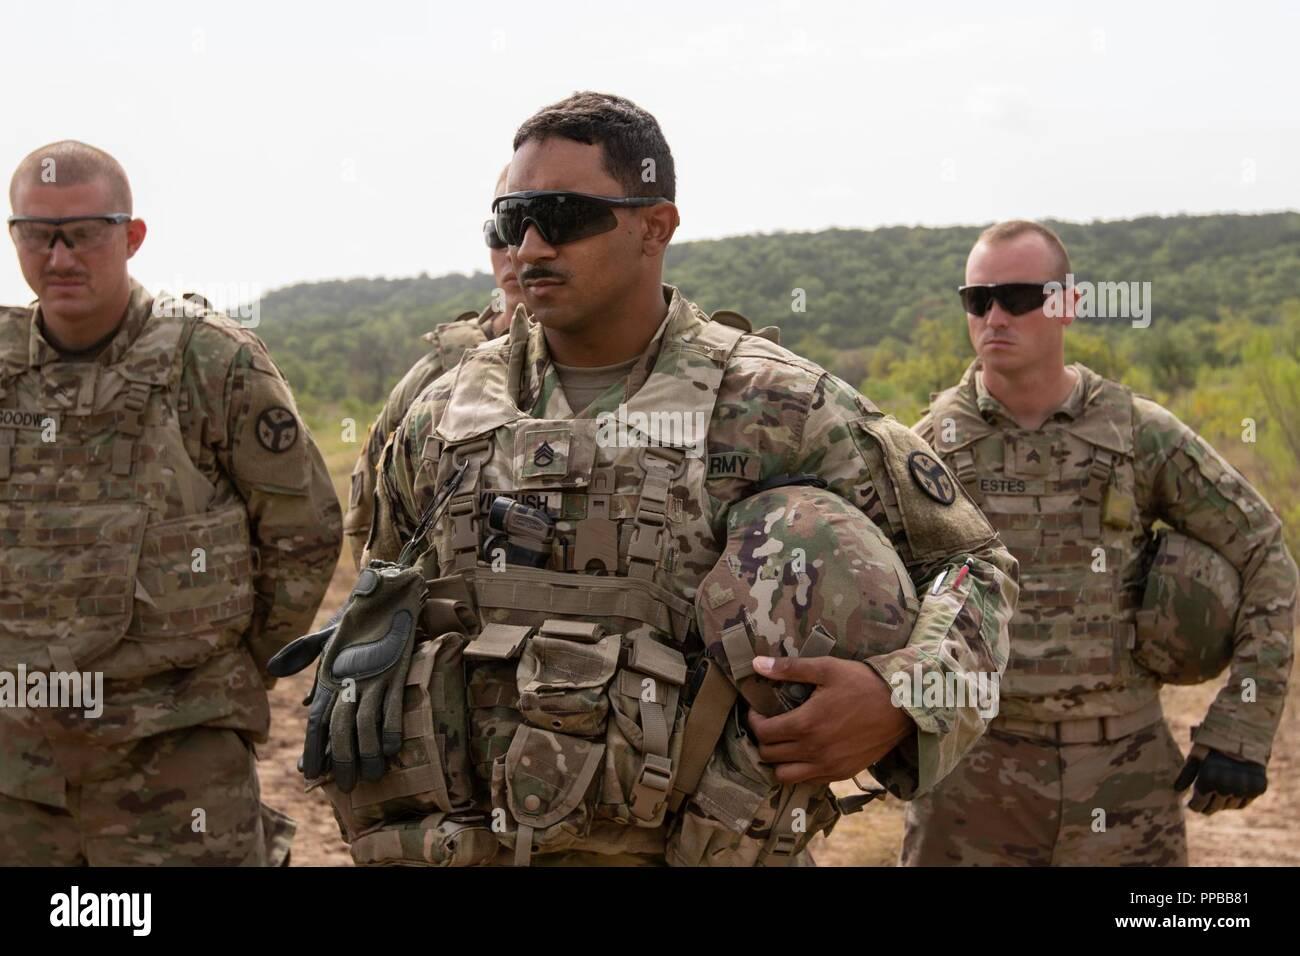 U S  Army Staff Sgt  Jeremy Windbush, a Chattanooga, Tenn  native